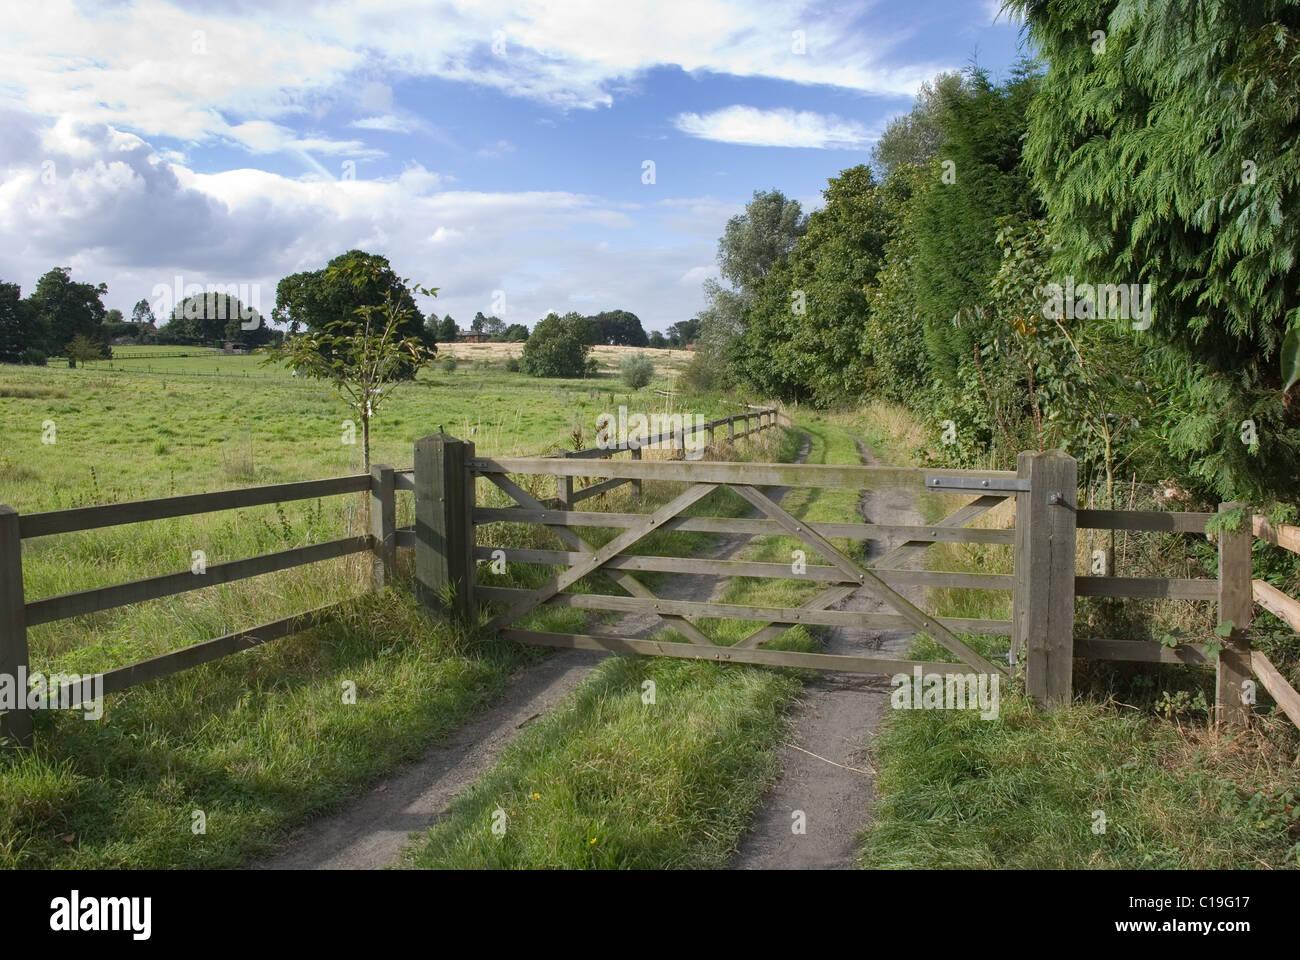 Wooden gate, Levington, Suffolk, England Stock Photo, Royalty Free ...